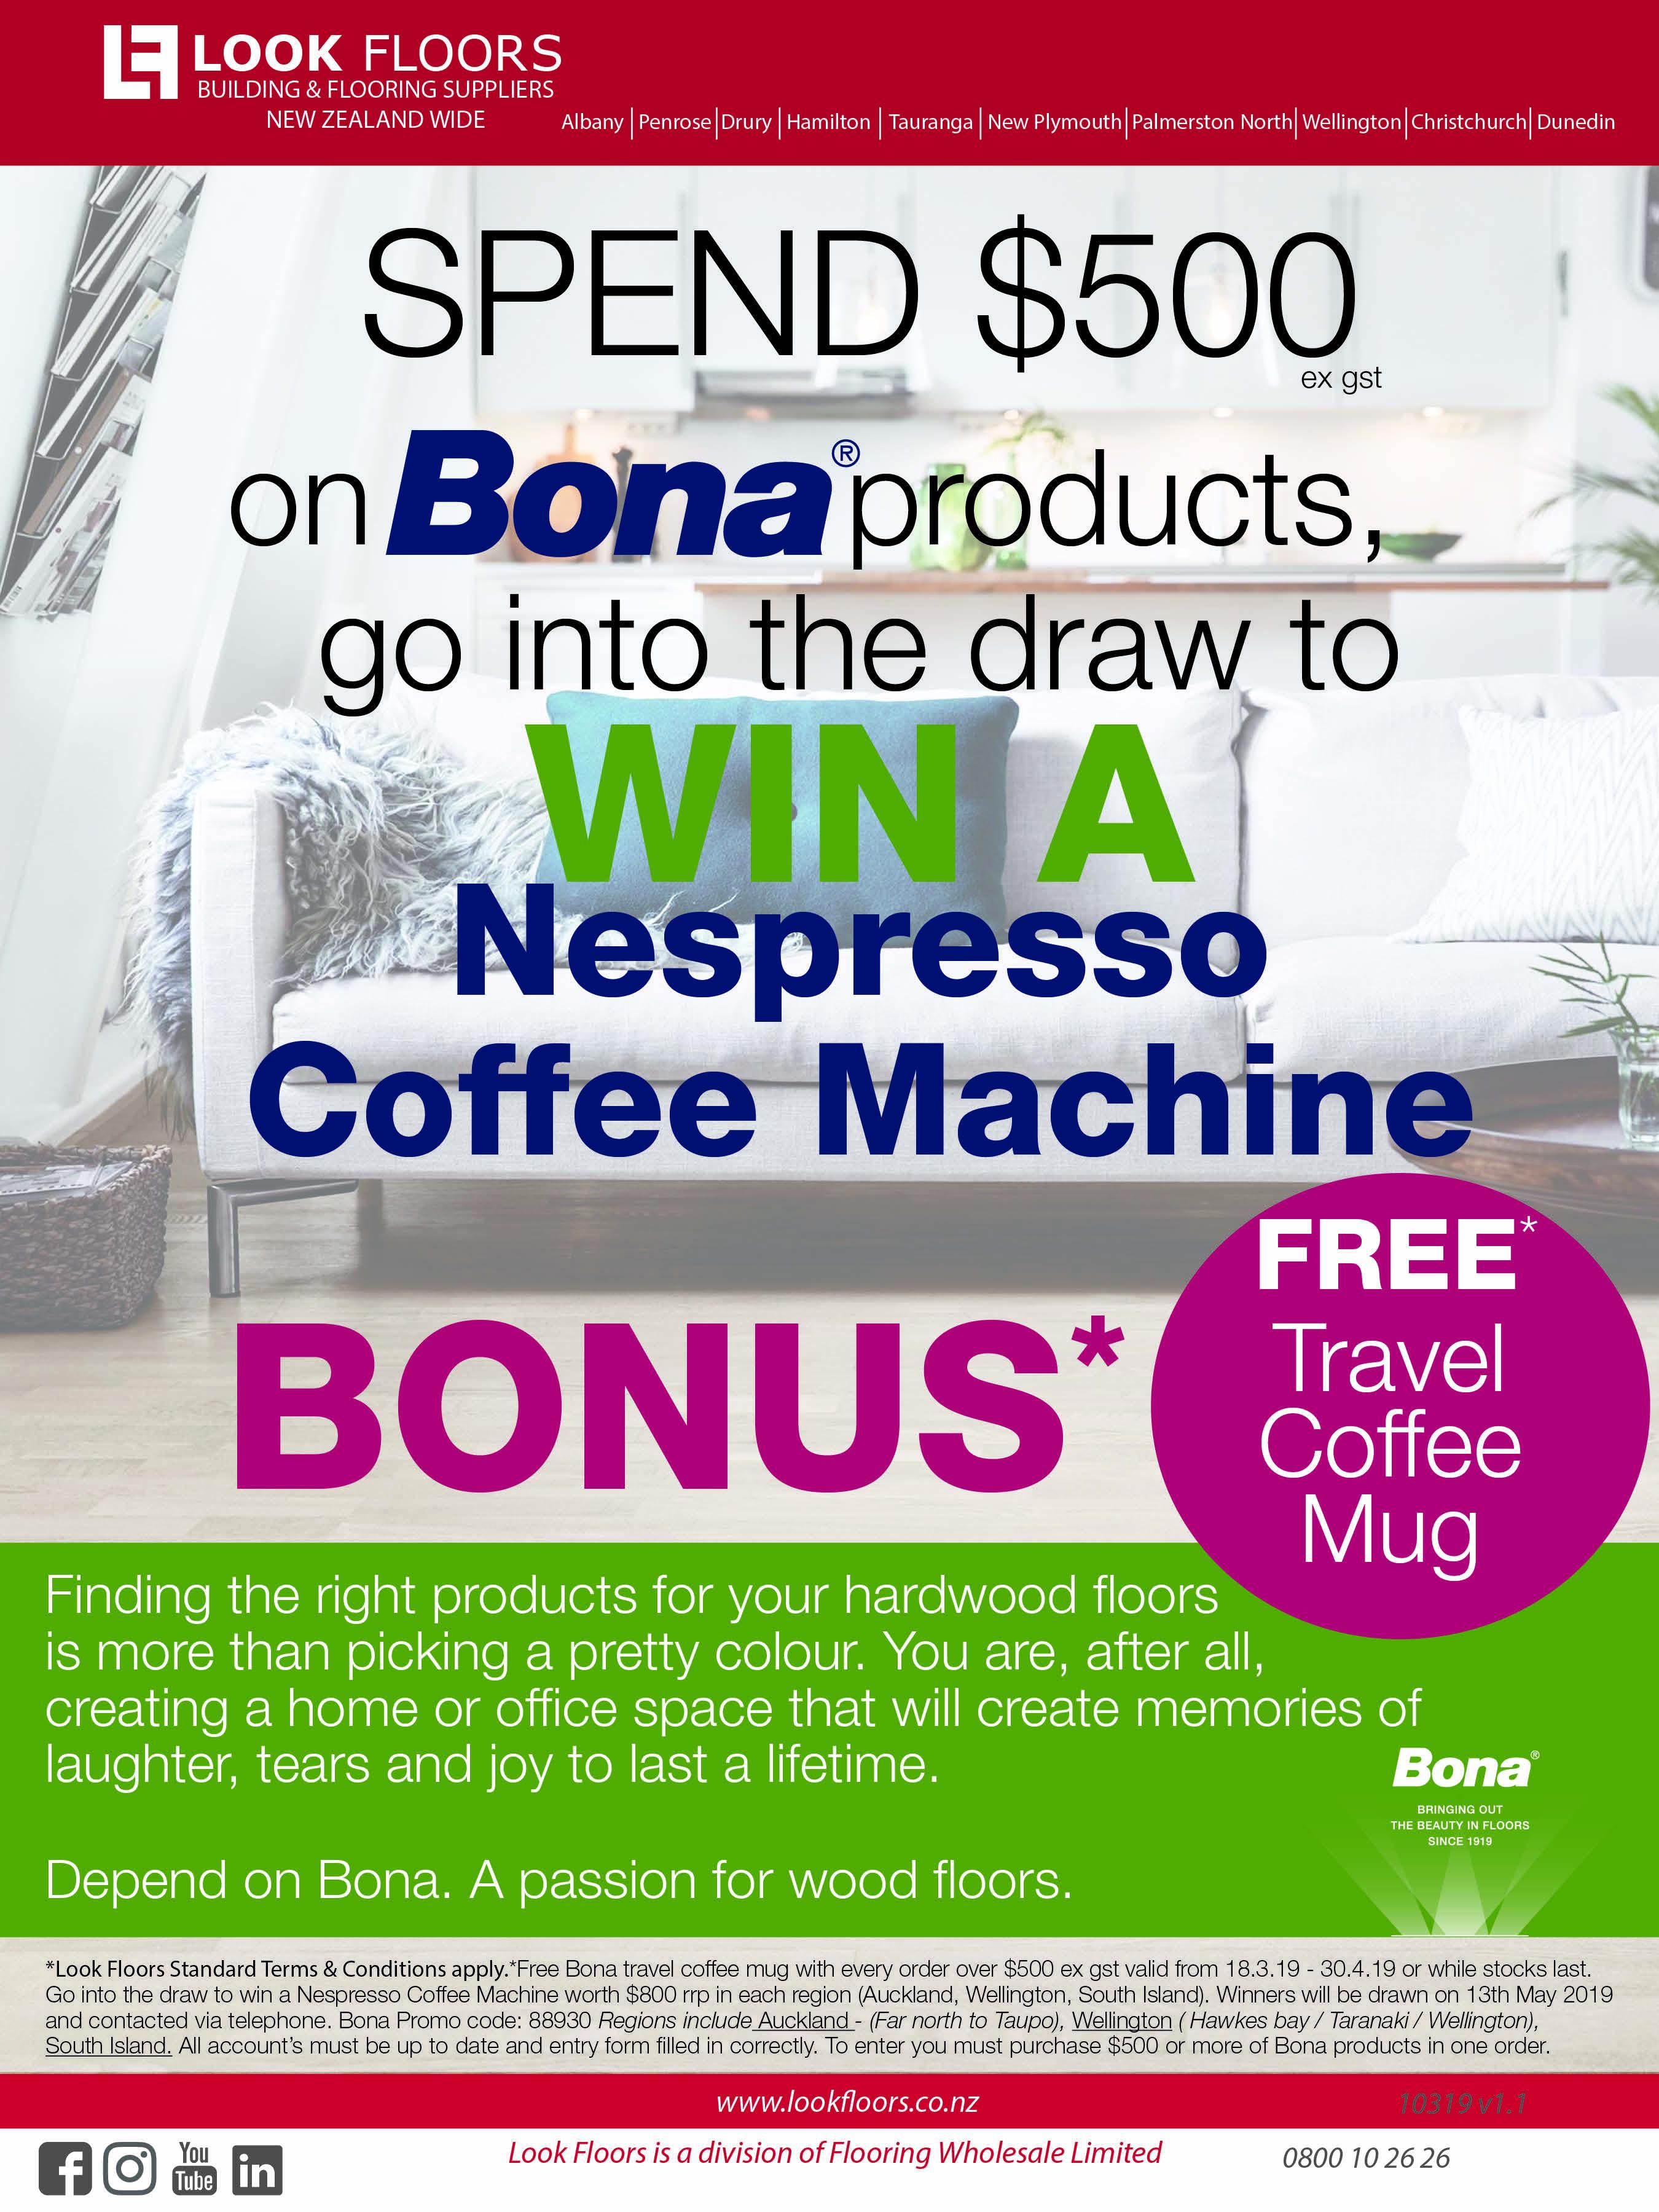 Bona Coffee Promotion